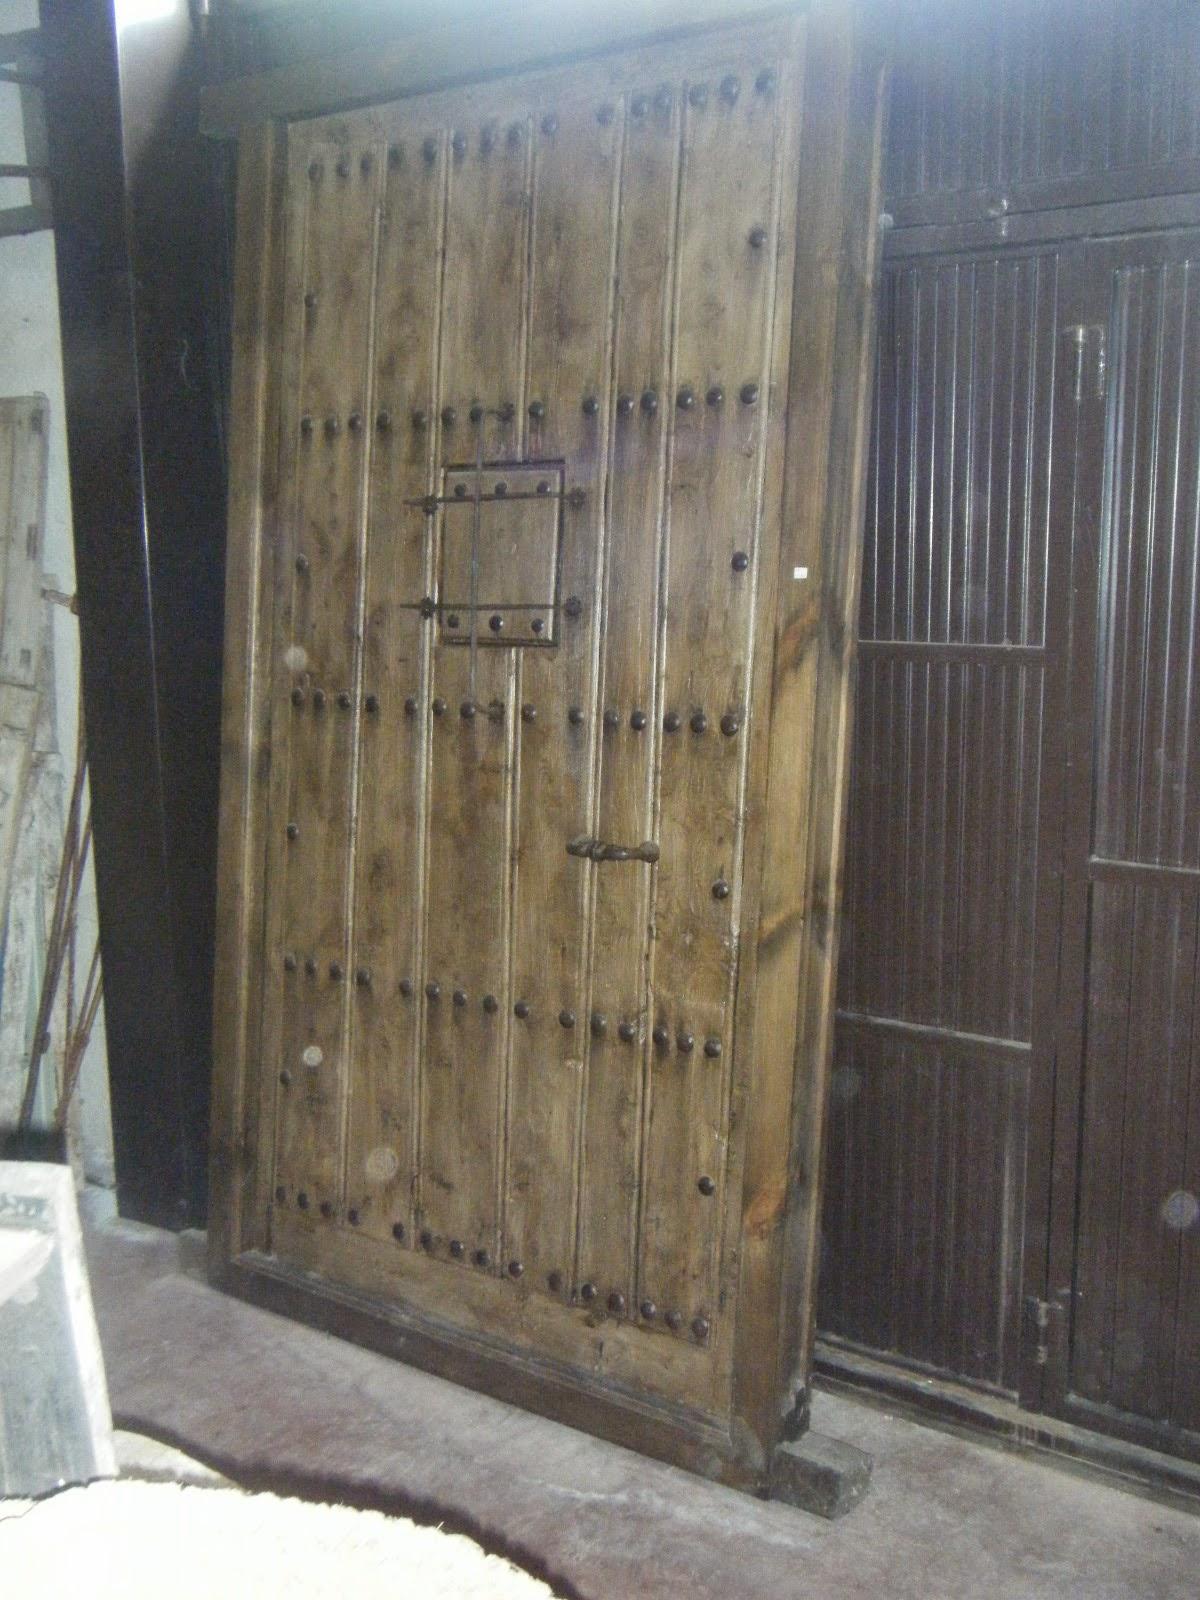 Antig edades almagro puertas ventanucos herrajes for Herrajes para puertas